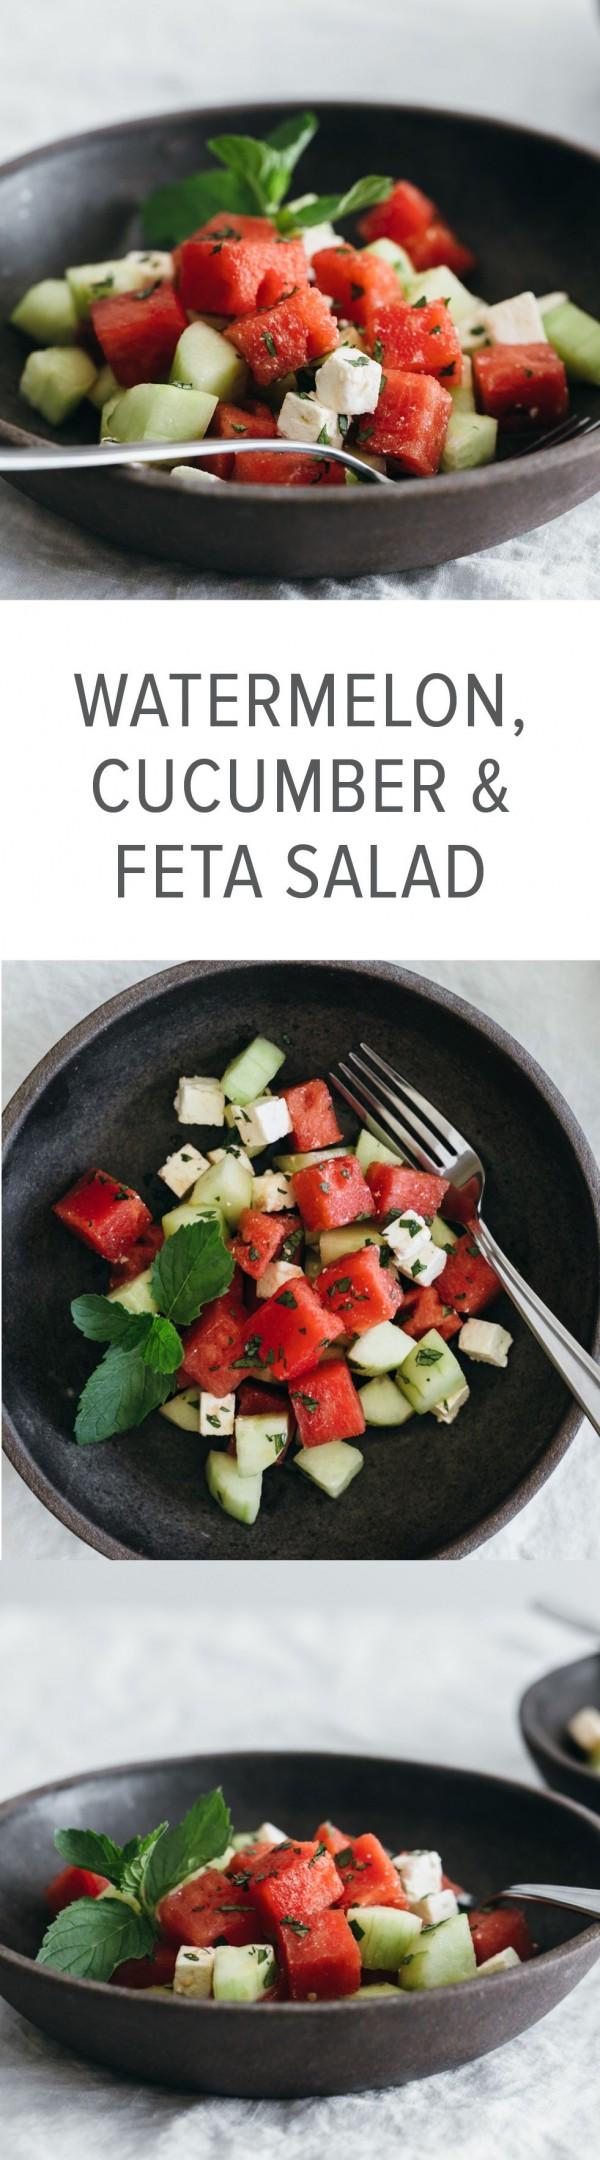 Get the recipe Watermelon Cucumber Feta Salad @recipes_to_go